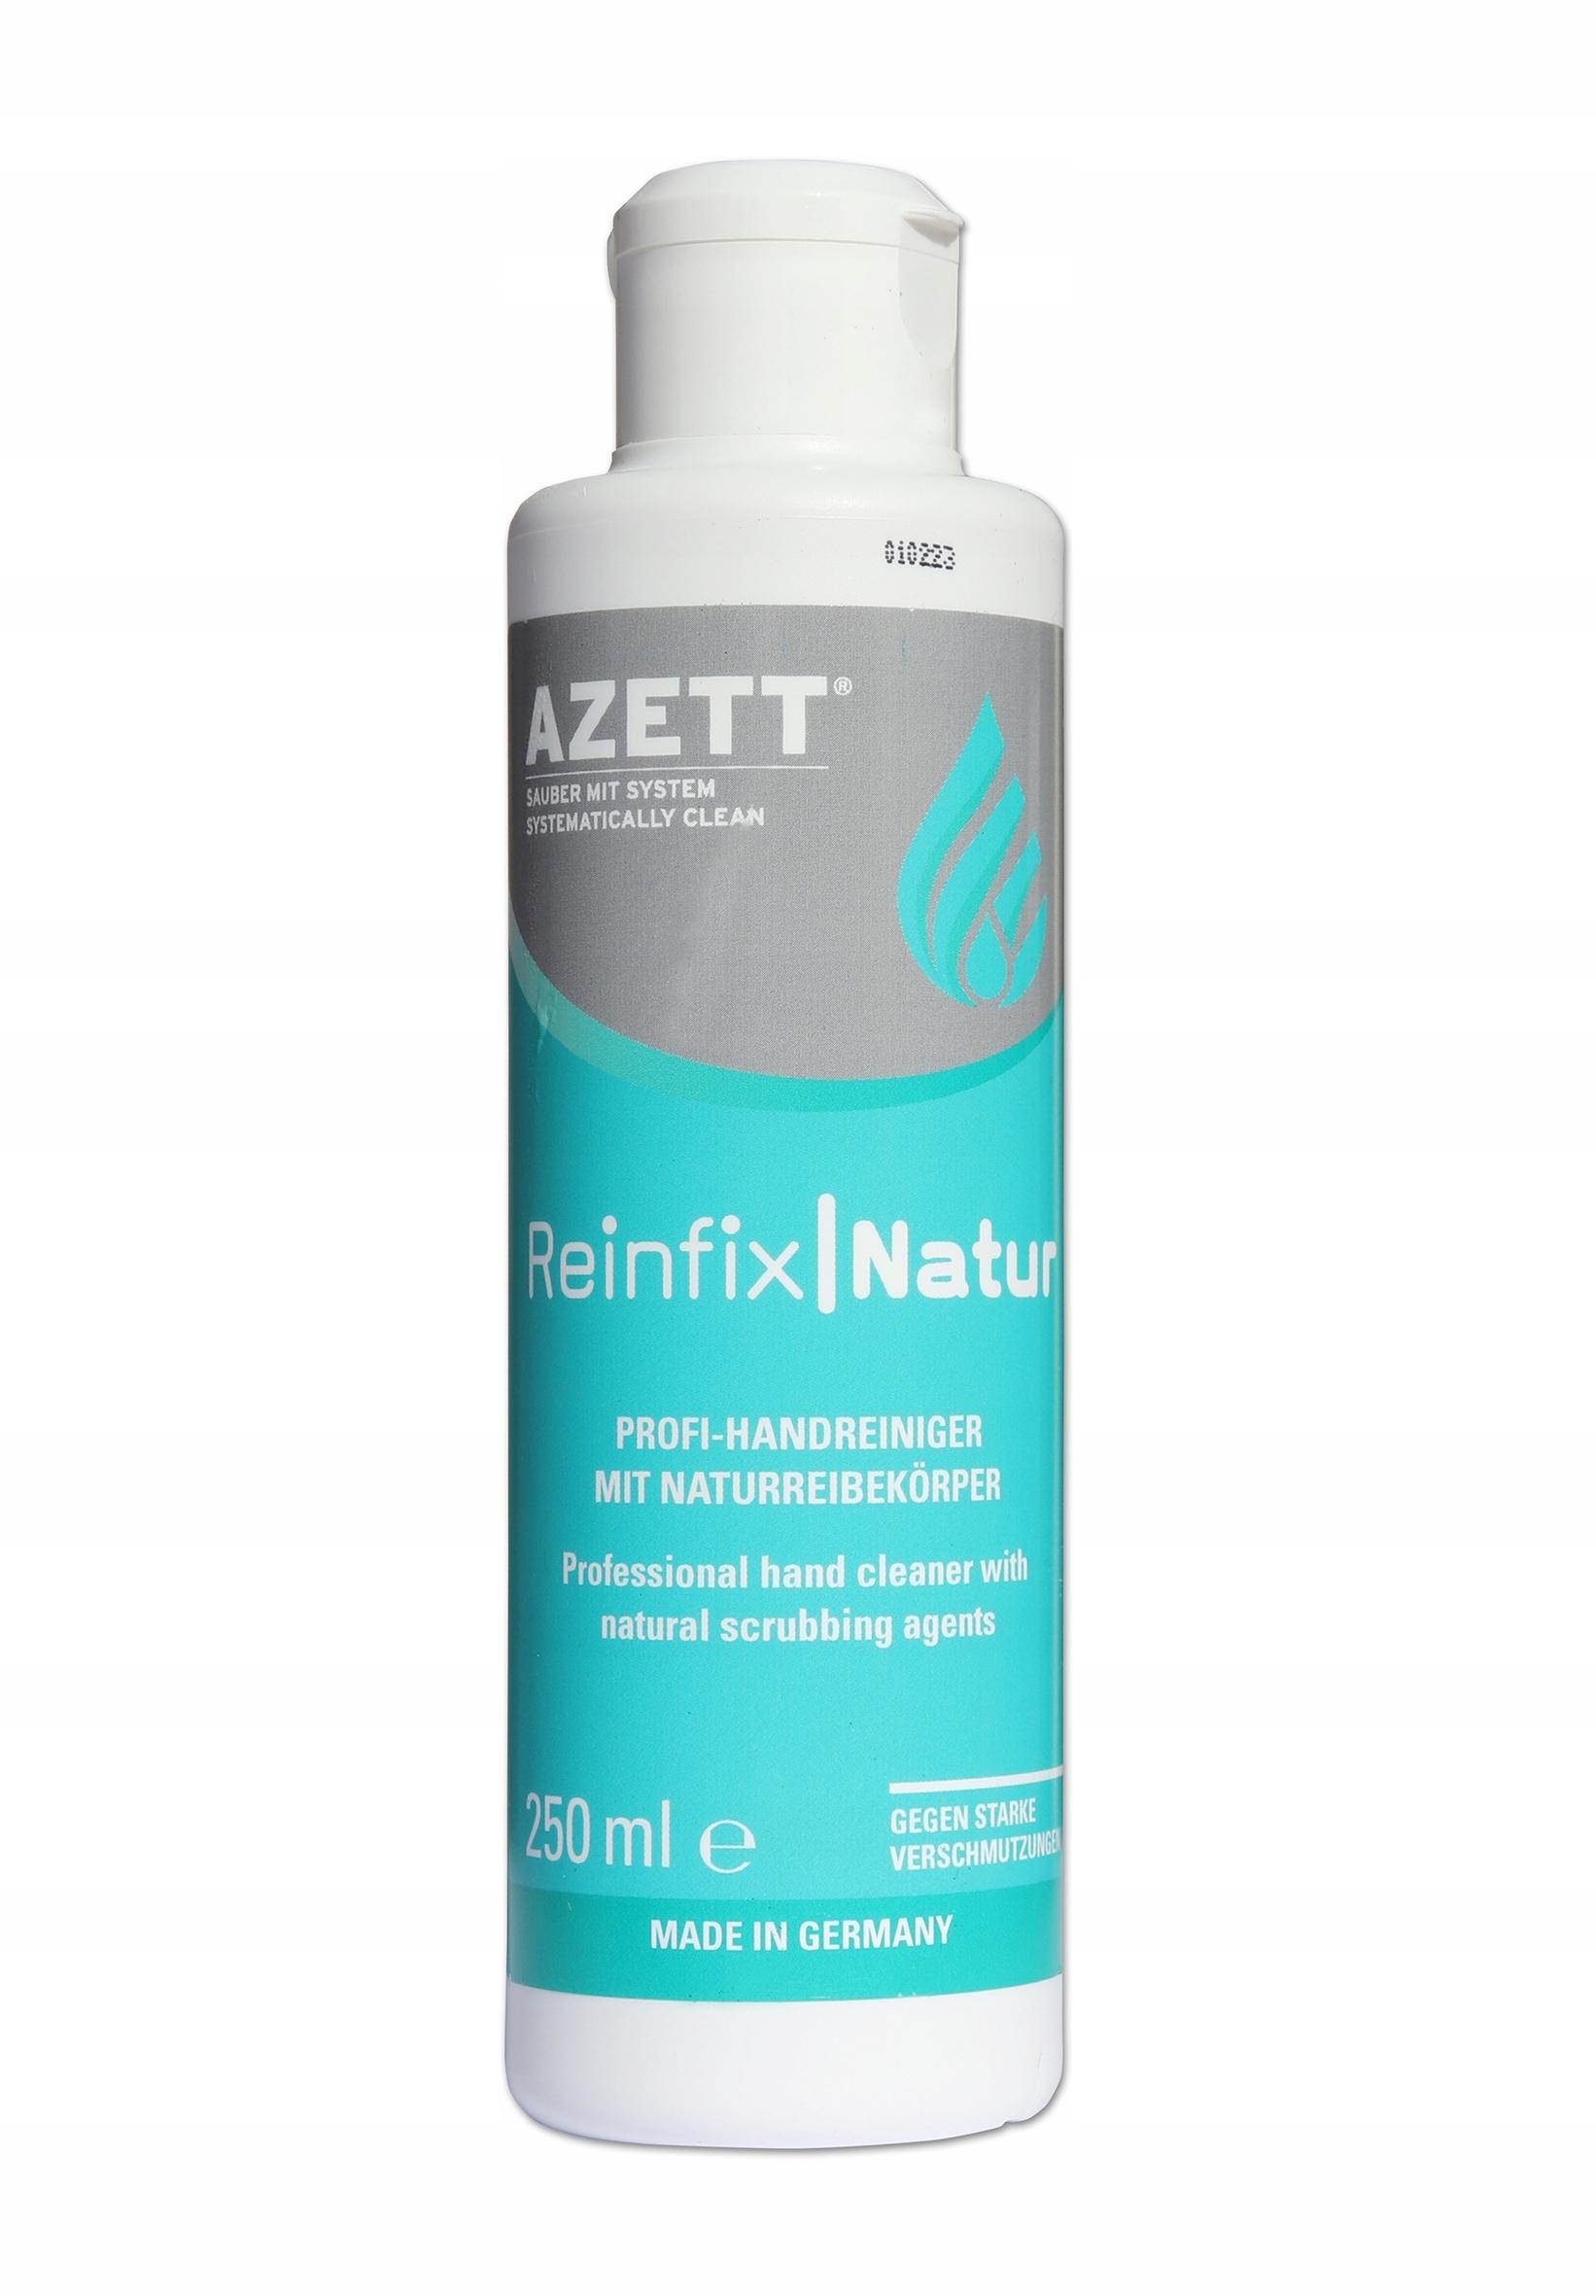 Pasta BHP krem do mycia rąk AZETT ReinfixNatur 250